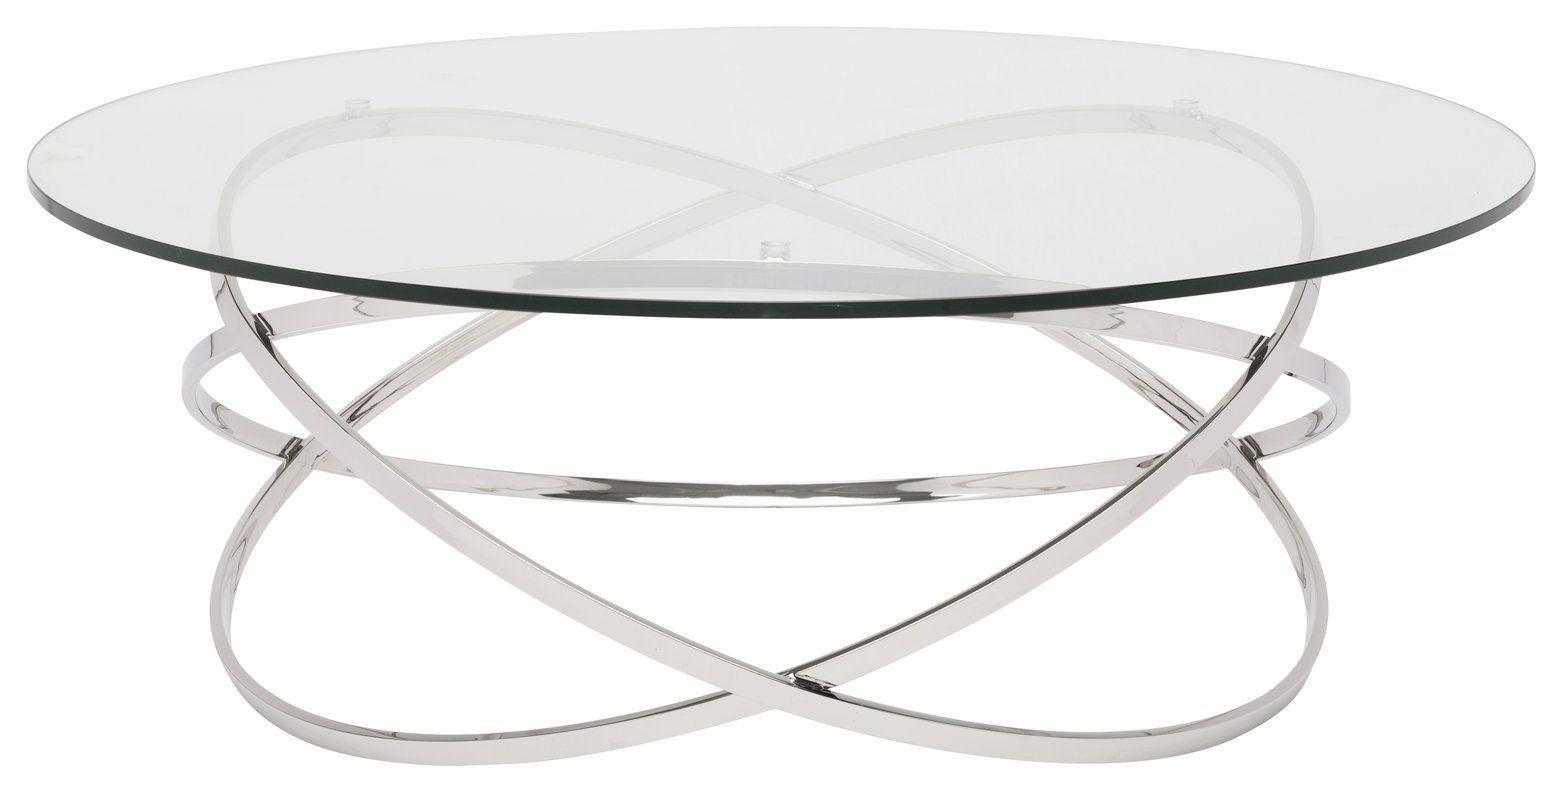 Corel Coffee Table Coffee Table Glass Coffee Table Coffee Table Wayfair [ 800 x 1567 Pixel ]